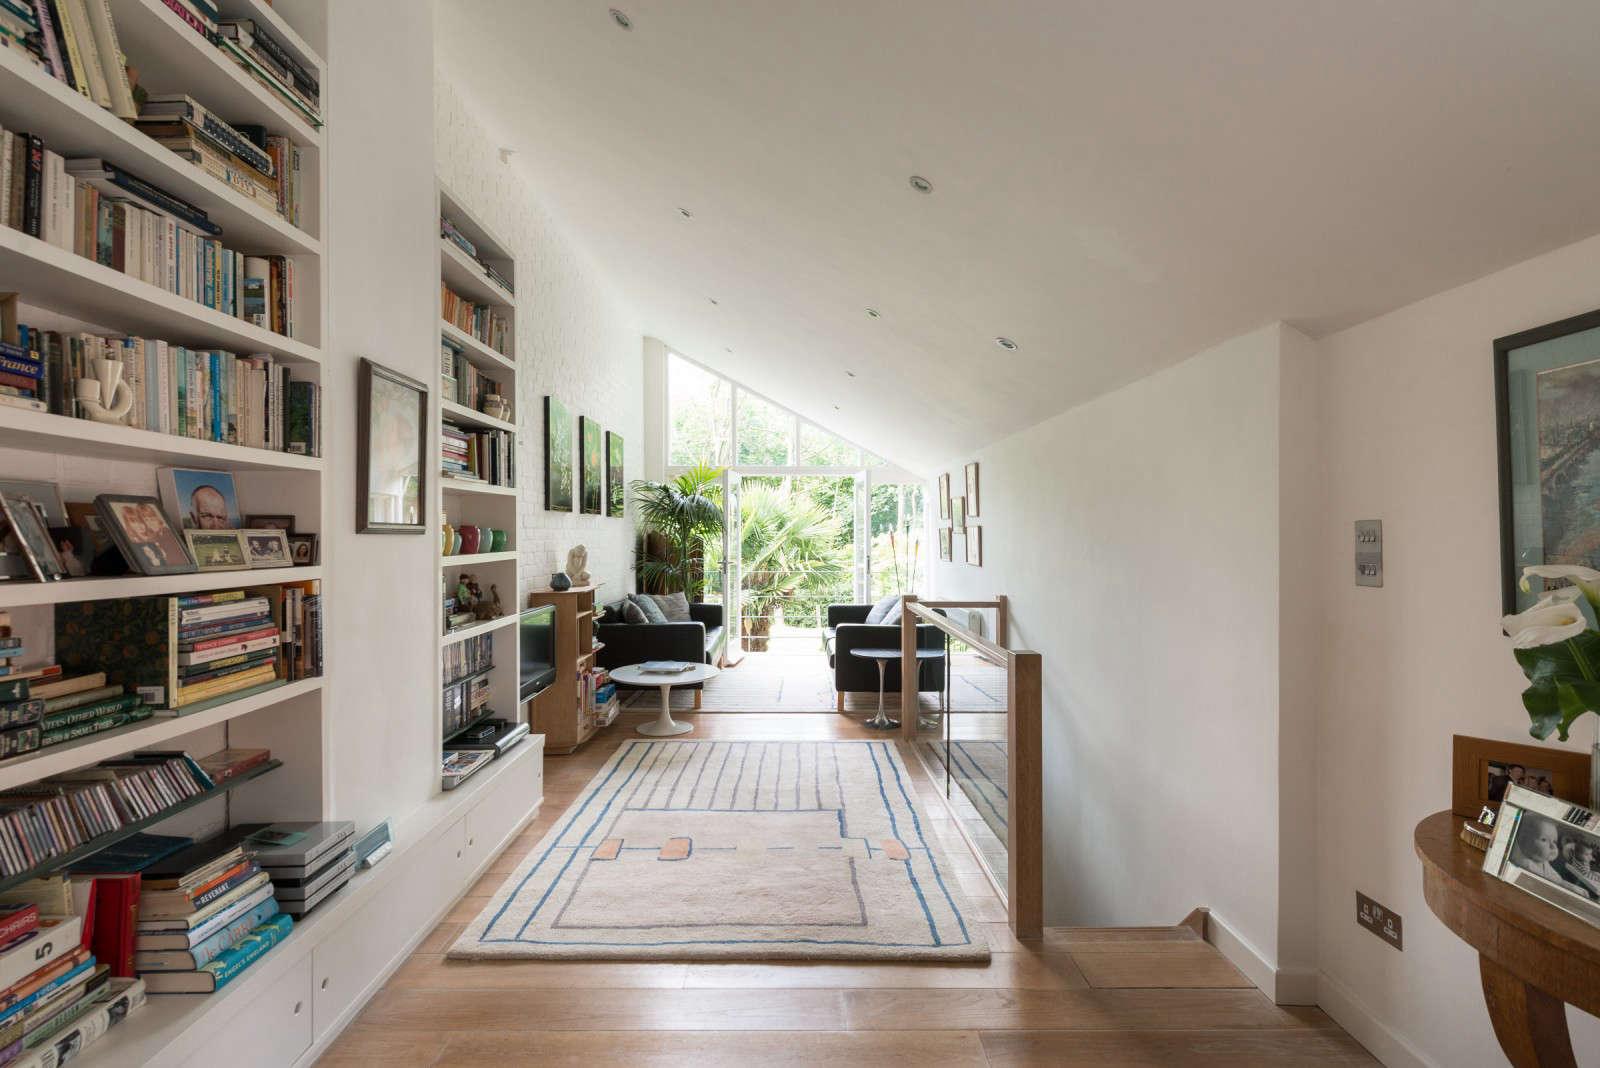 greenhouse-conversion-kent-indoors-bookshelf-view-3